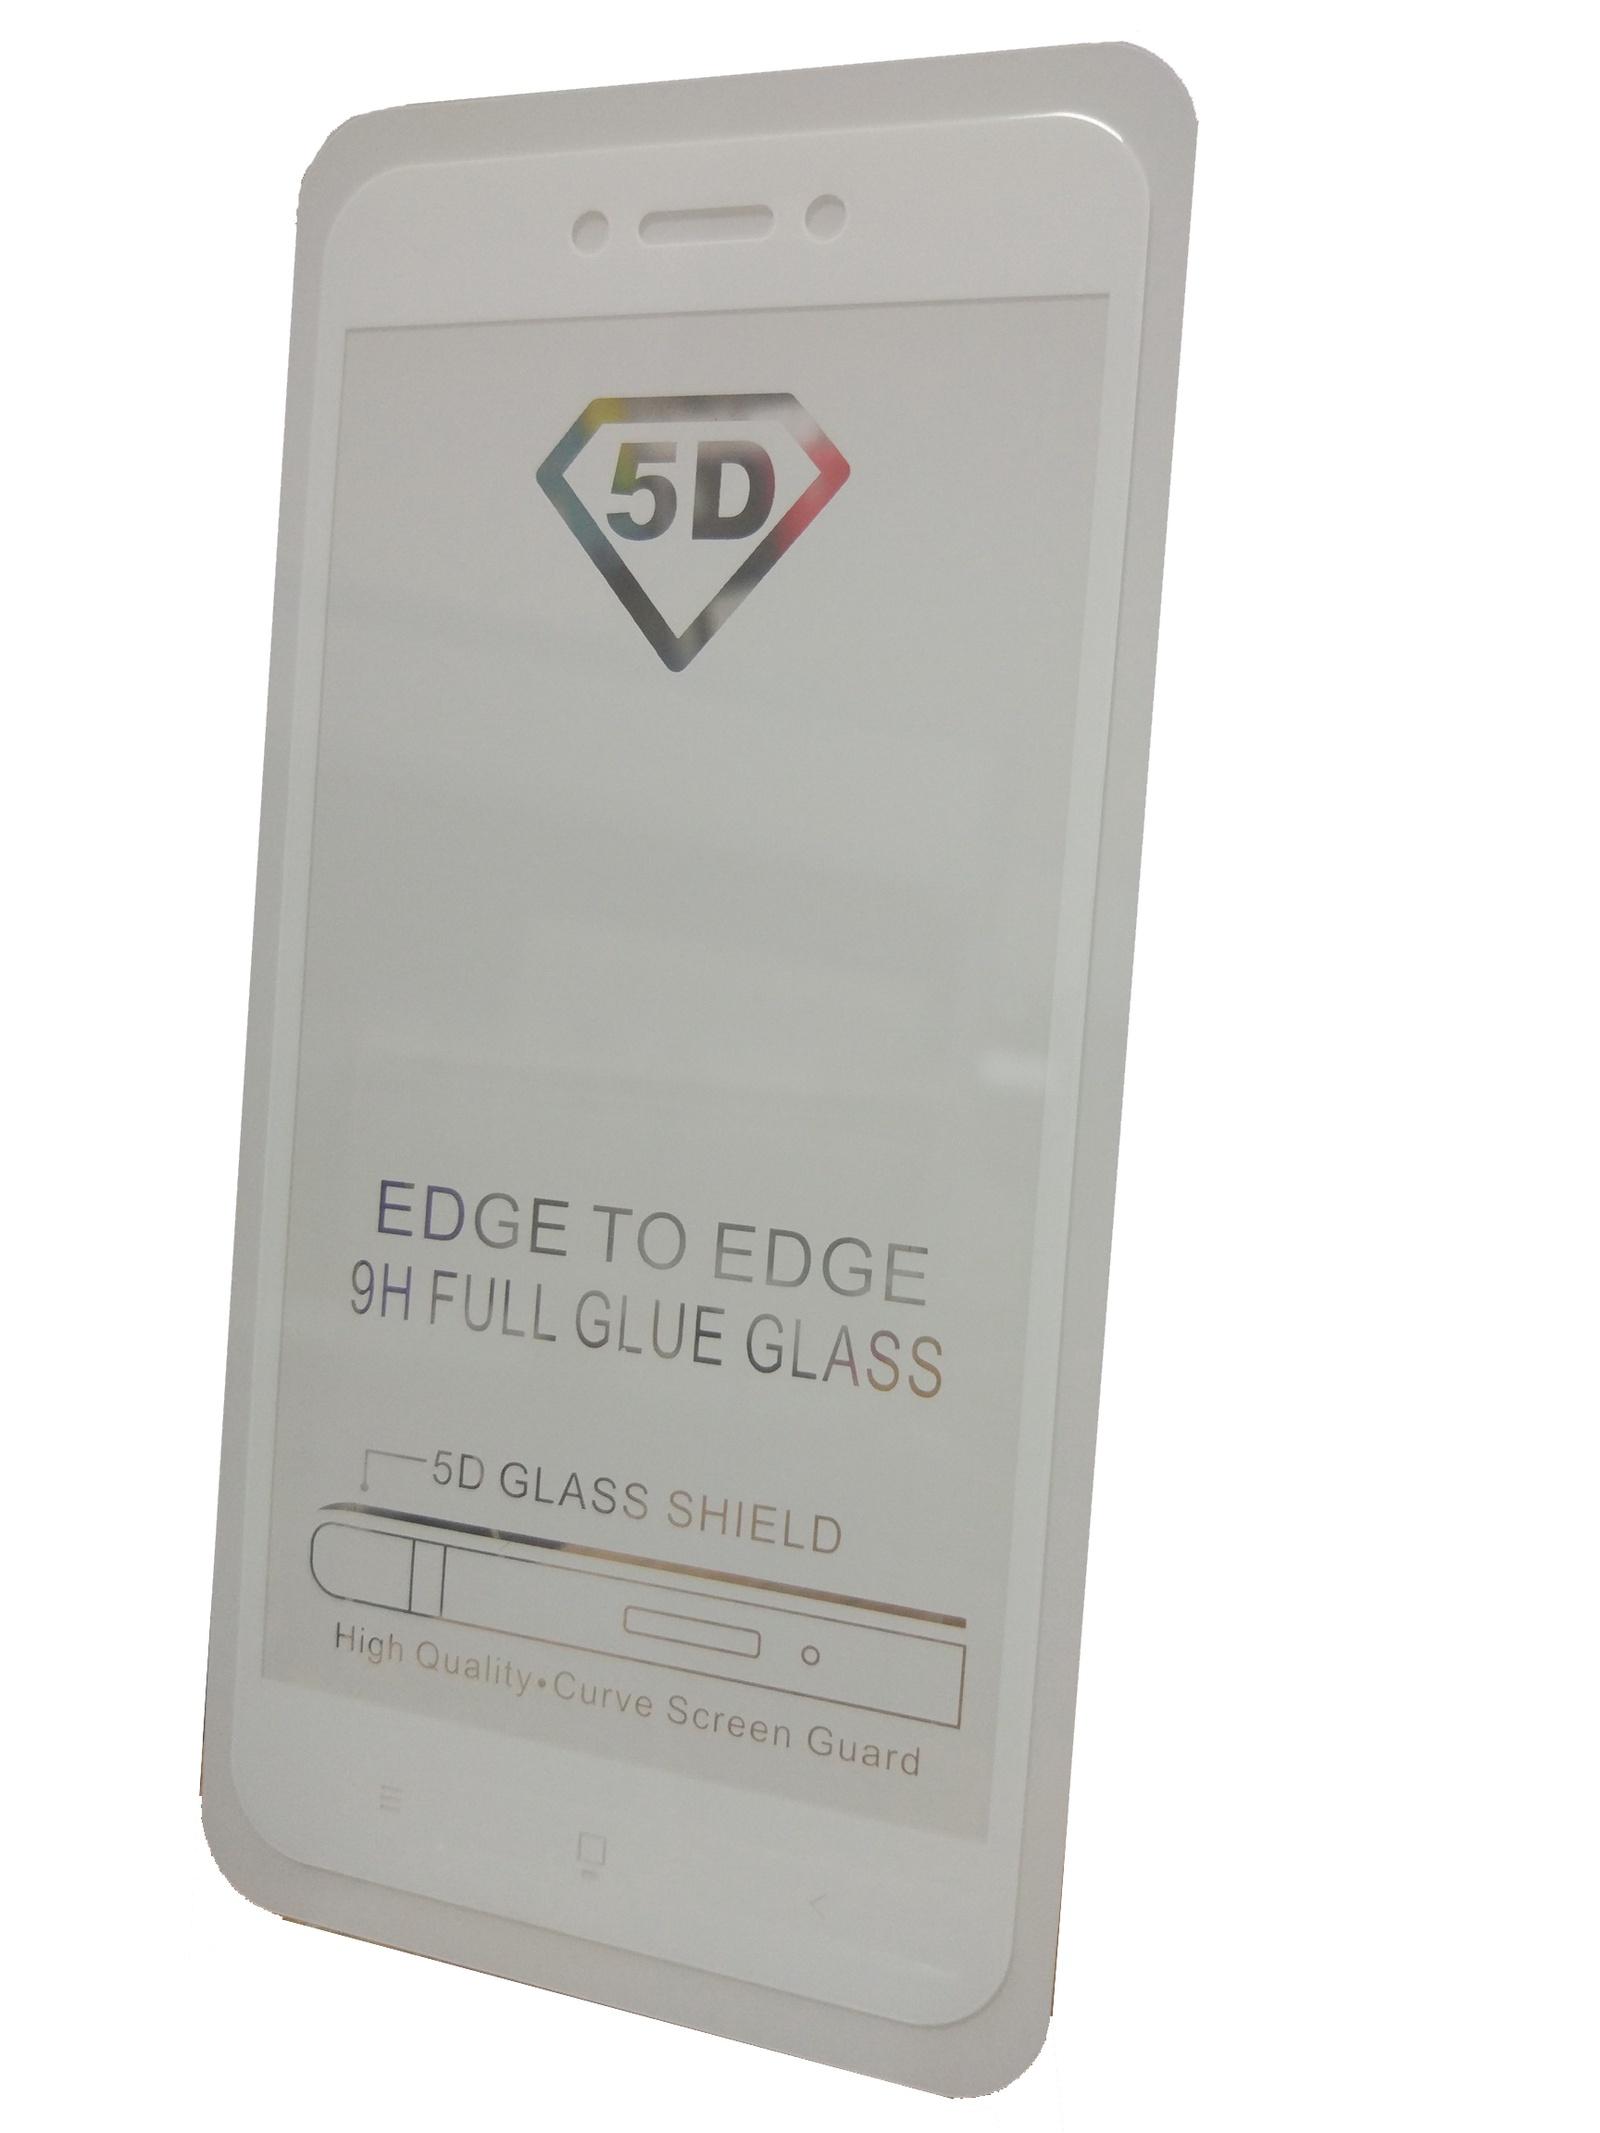 Защитное стекло Xiaomi Redmi 5A (полная проклейка белая рамка), белый защитное стекло для xiaomi redmi note 5a white